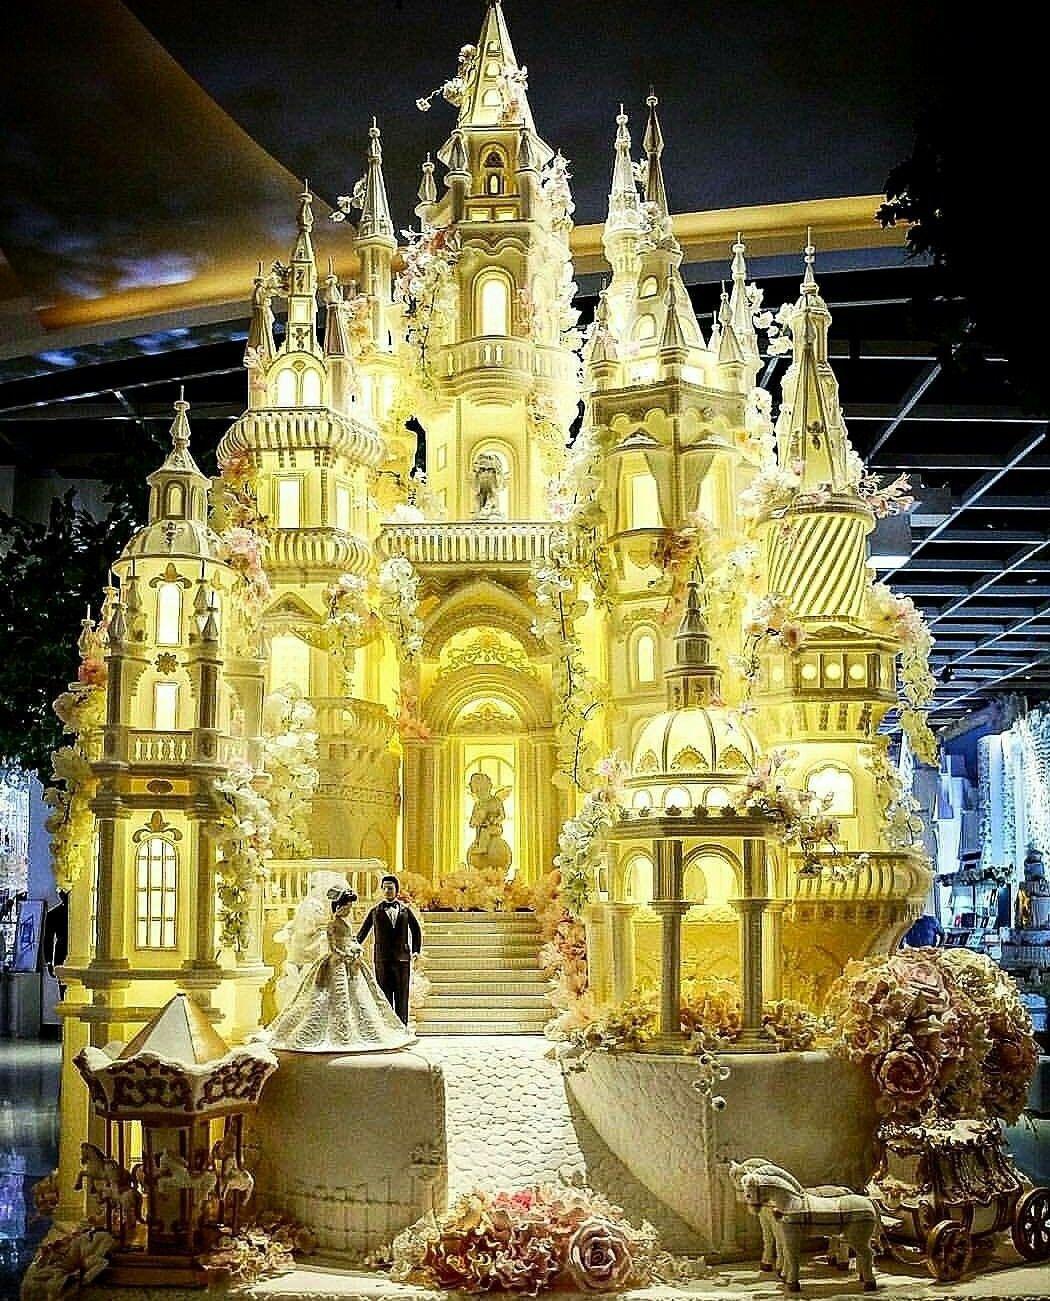 enormous castle cake Huge wedding cakes, Big wedding